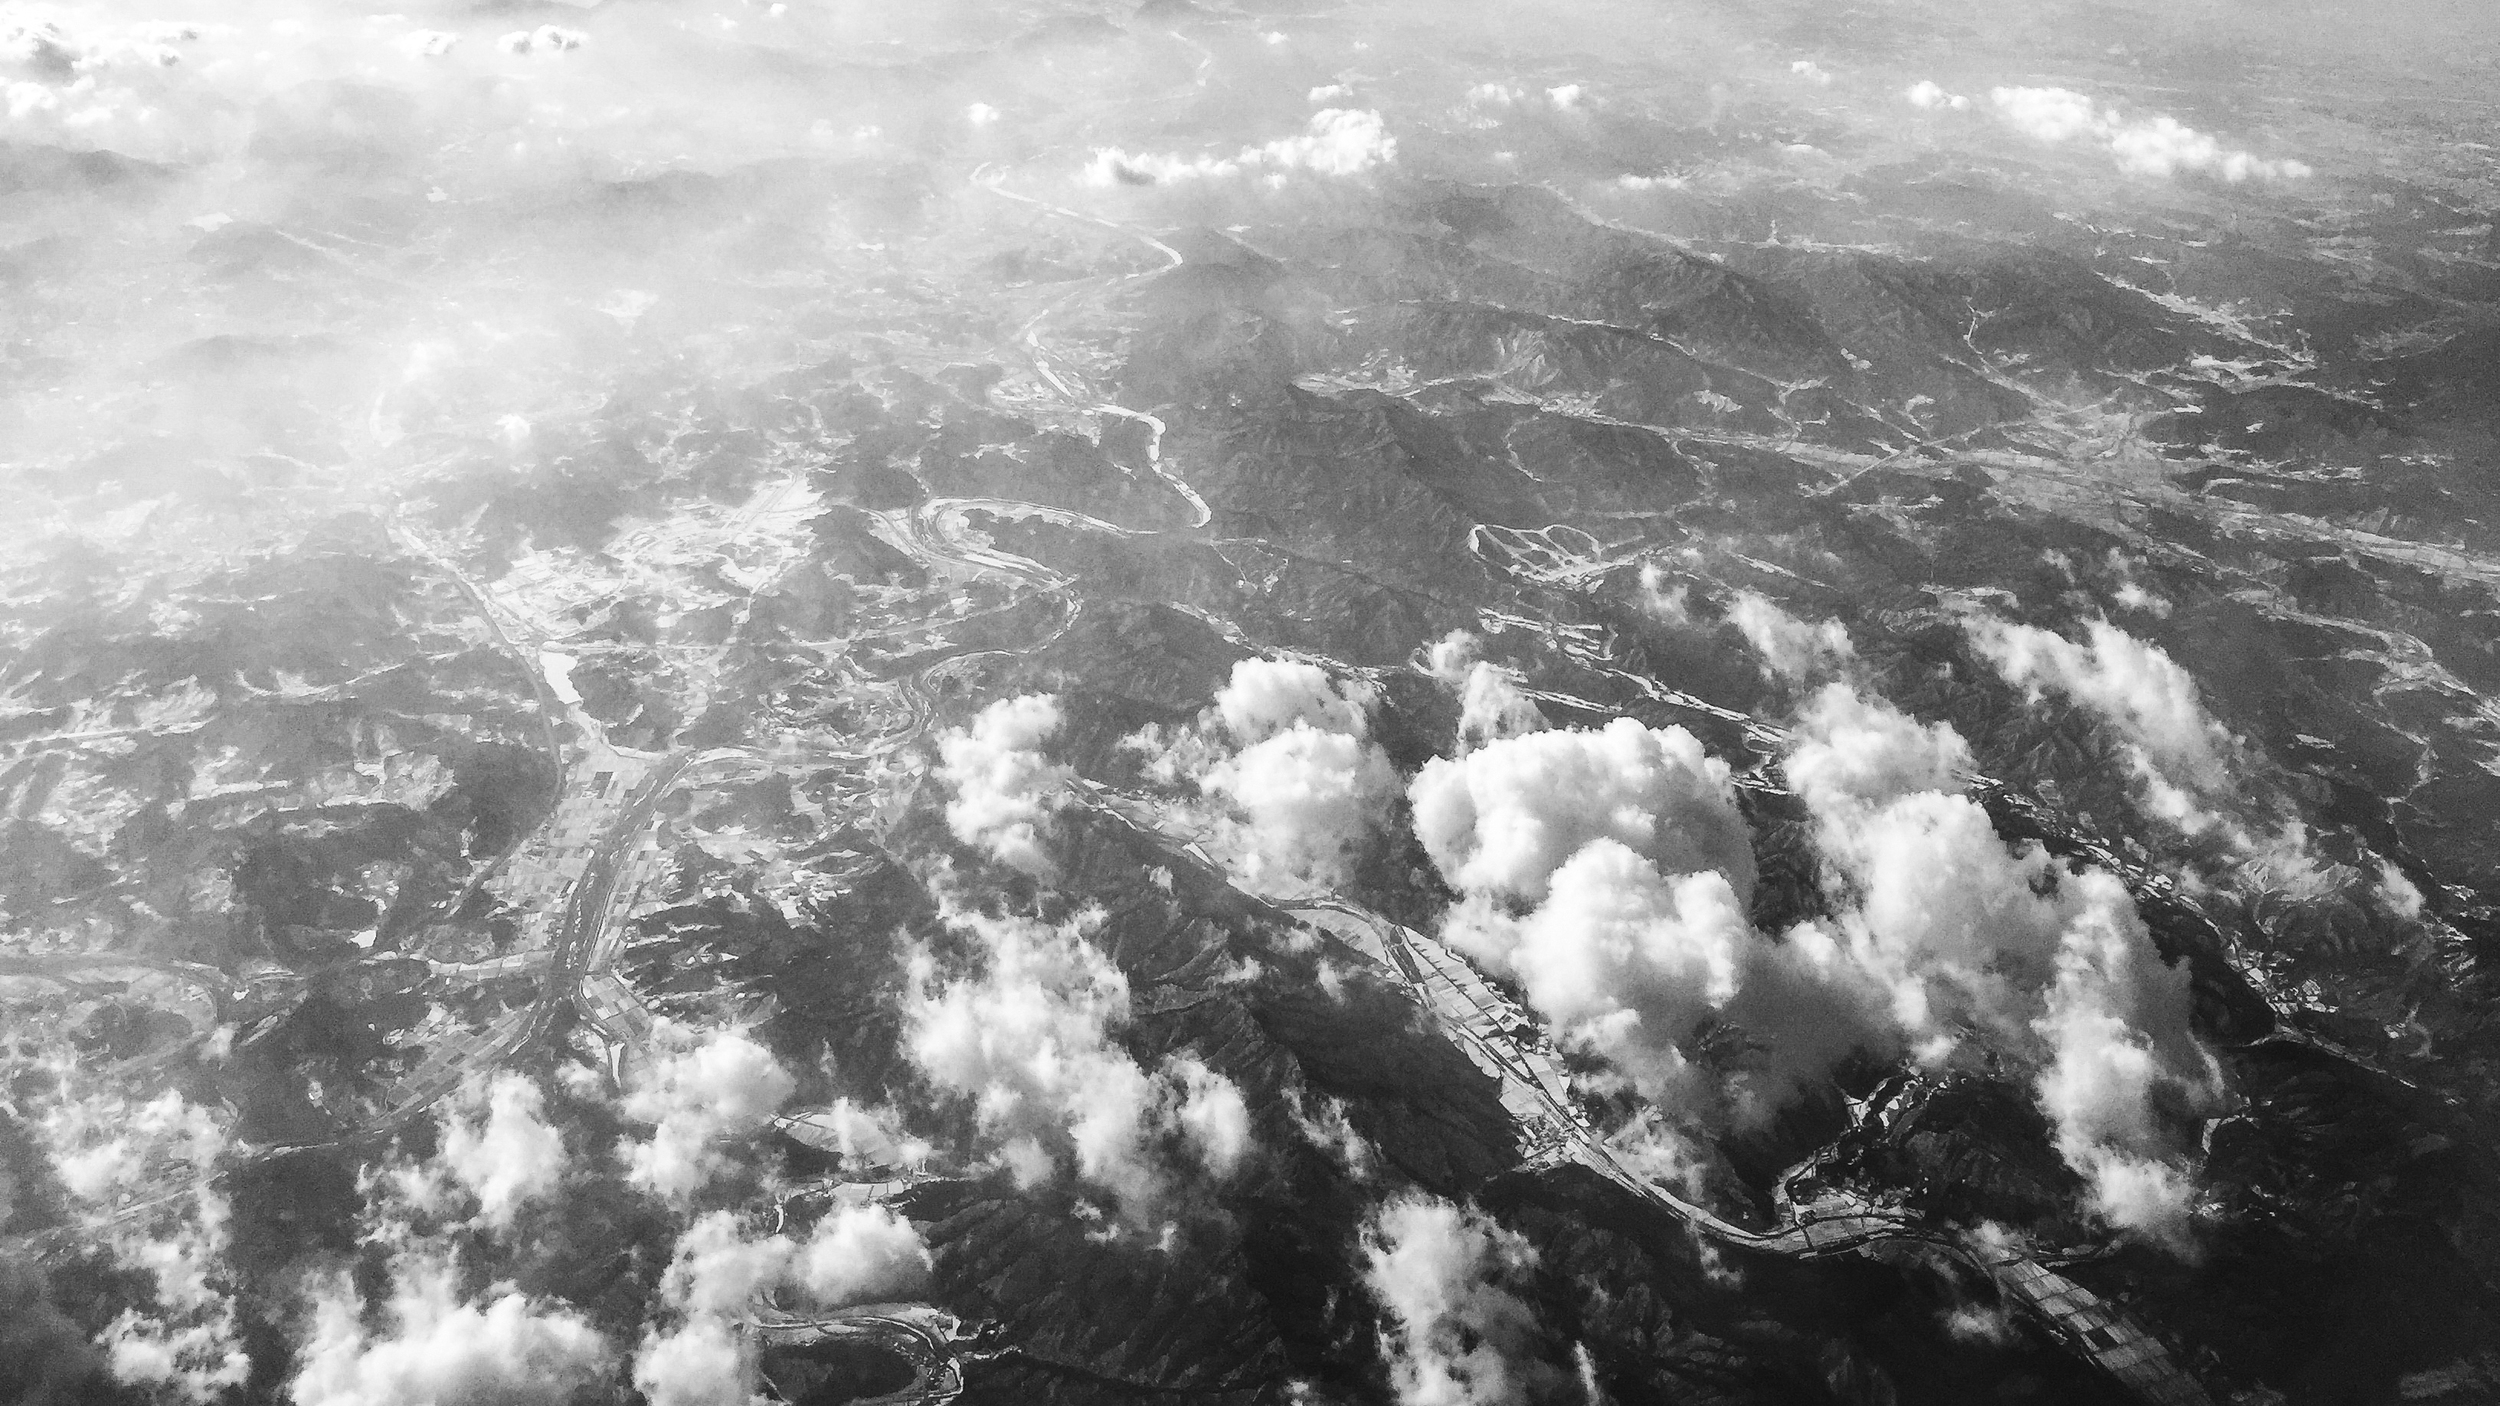 Title: Rio Grande National Forest, Colorado Year: 2014 Medium: Silver Gelatin Print Dimension: 17 × 22 in (43.18 × 55.88 cm)